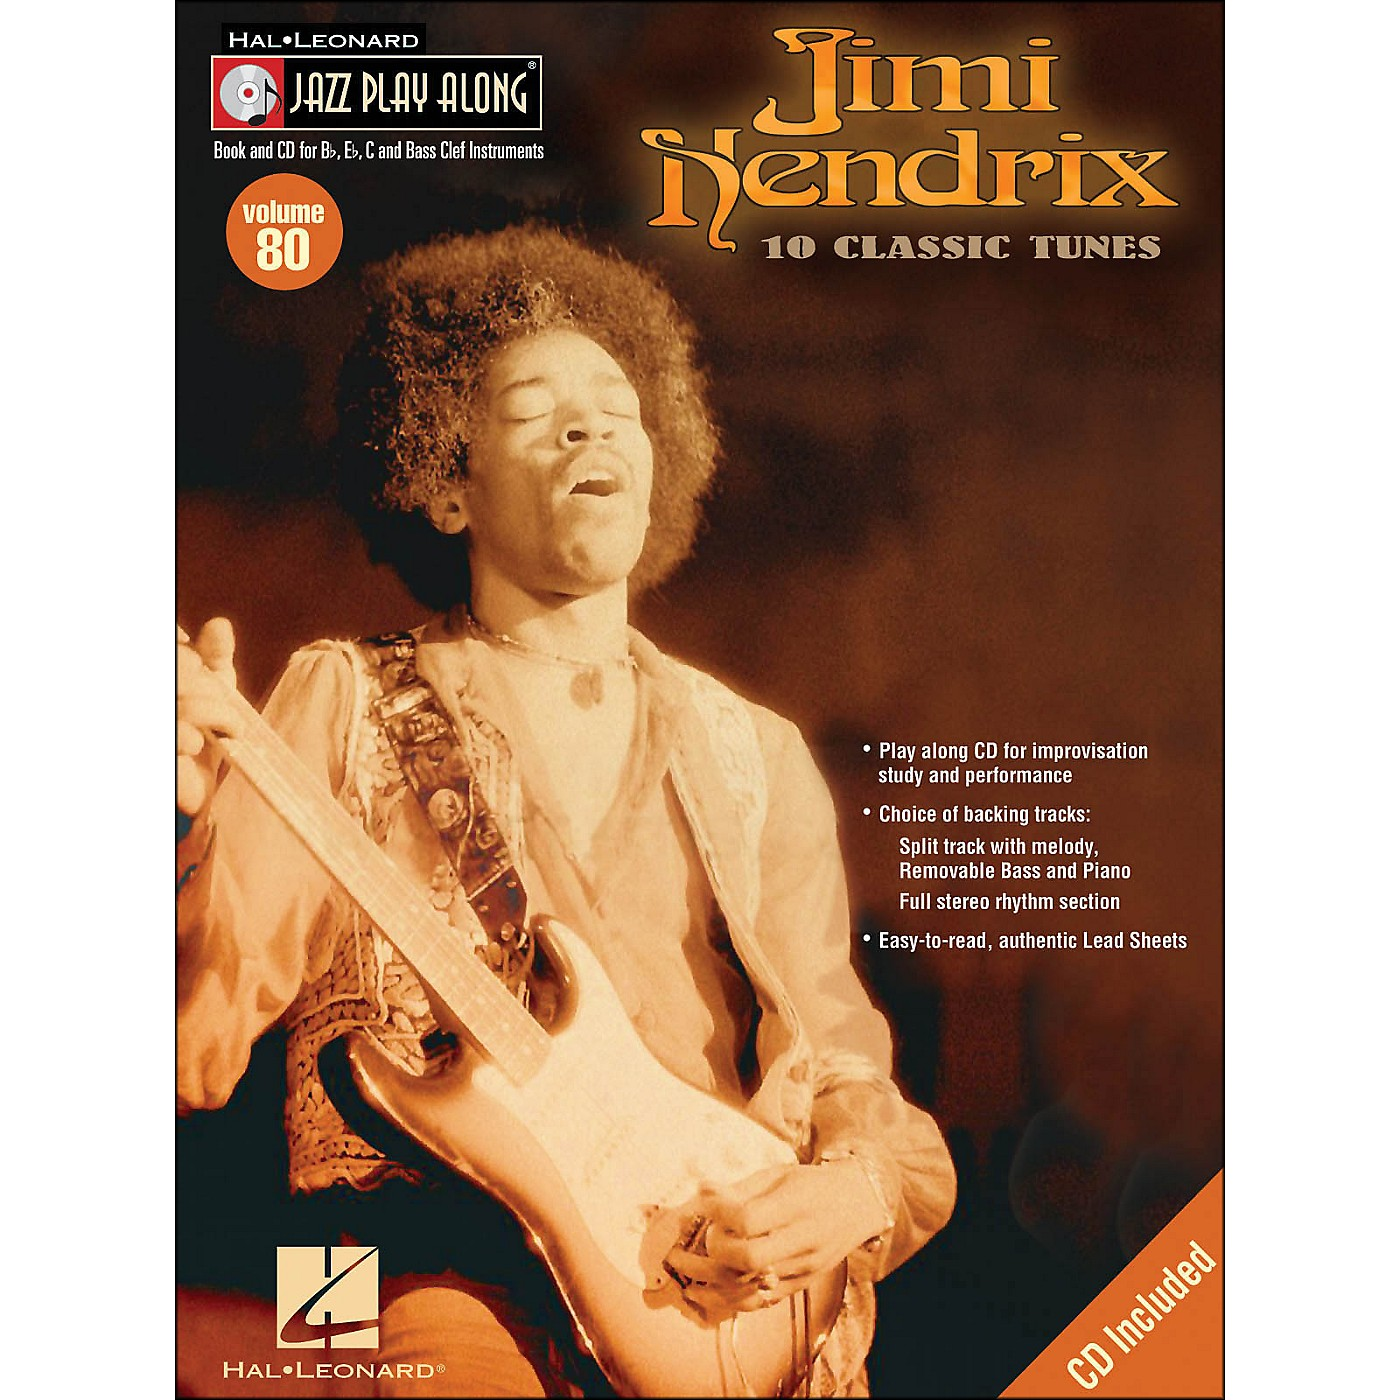 Hal Leonard Jimi Hendrix Jazz Play-Along Volume 80 Book/CD thumbnail